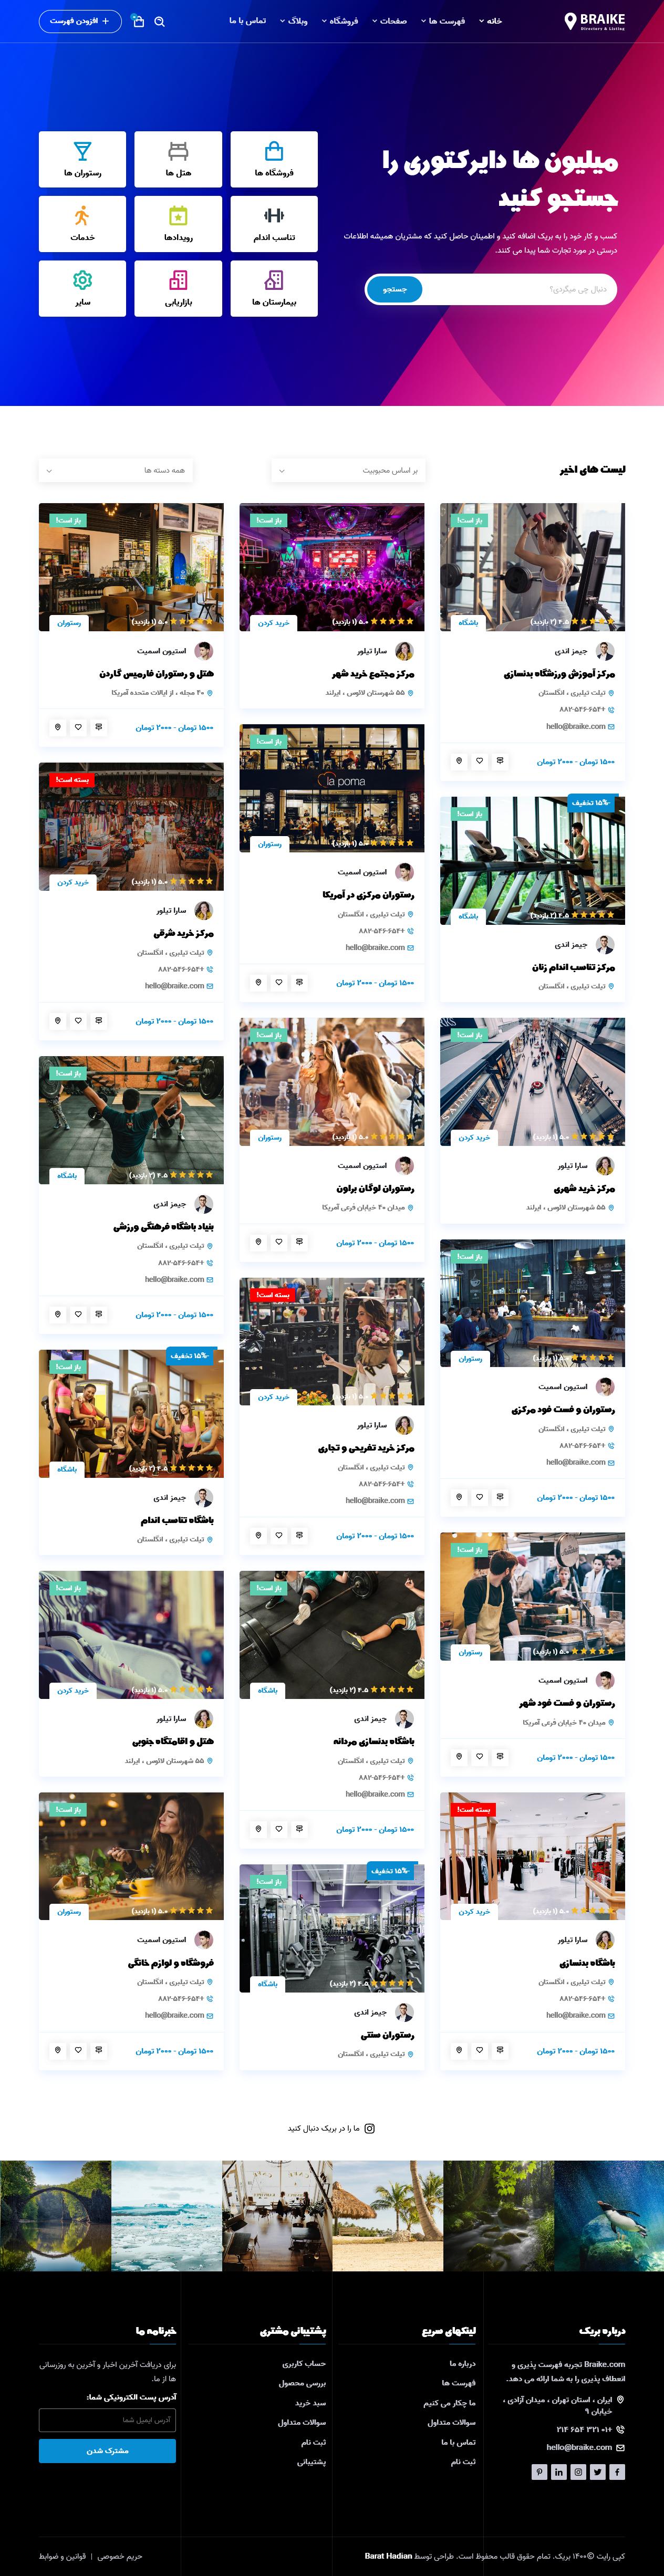 قالب Braike، قالب HTML فهرست و آگهی بریک